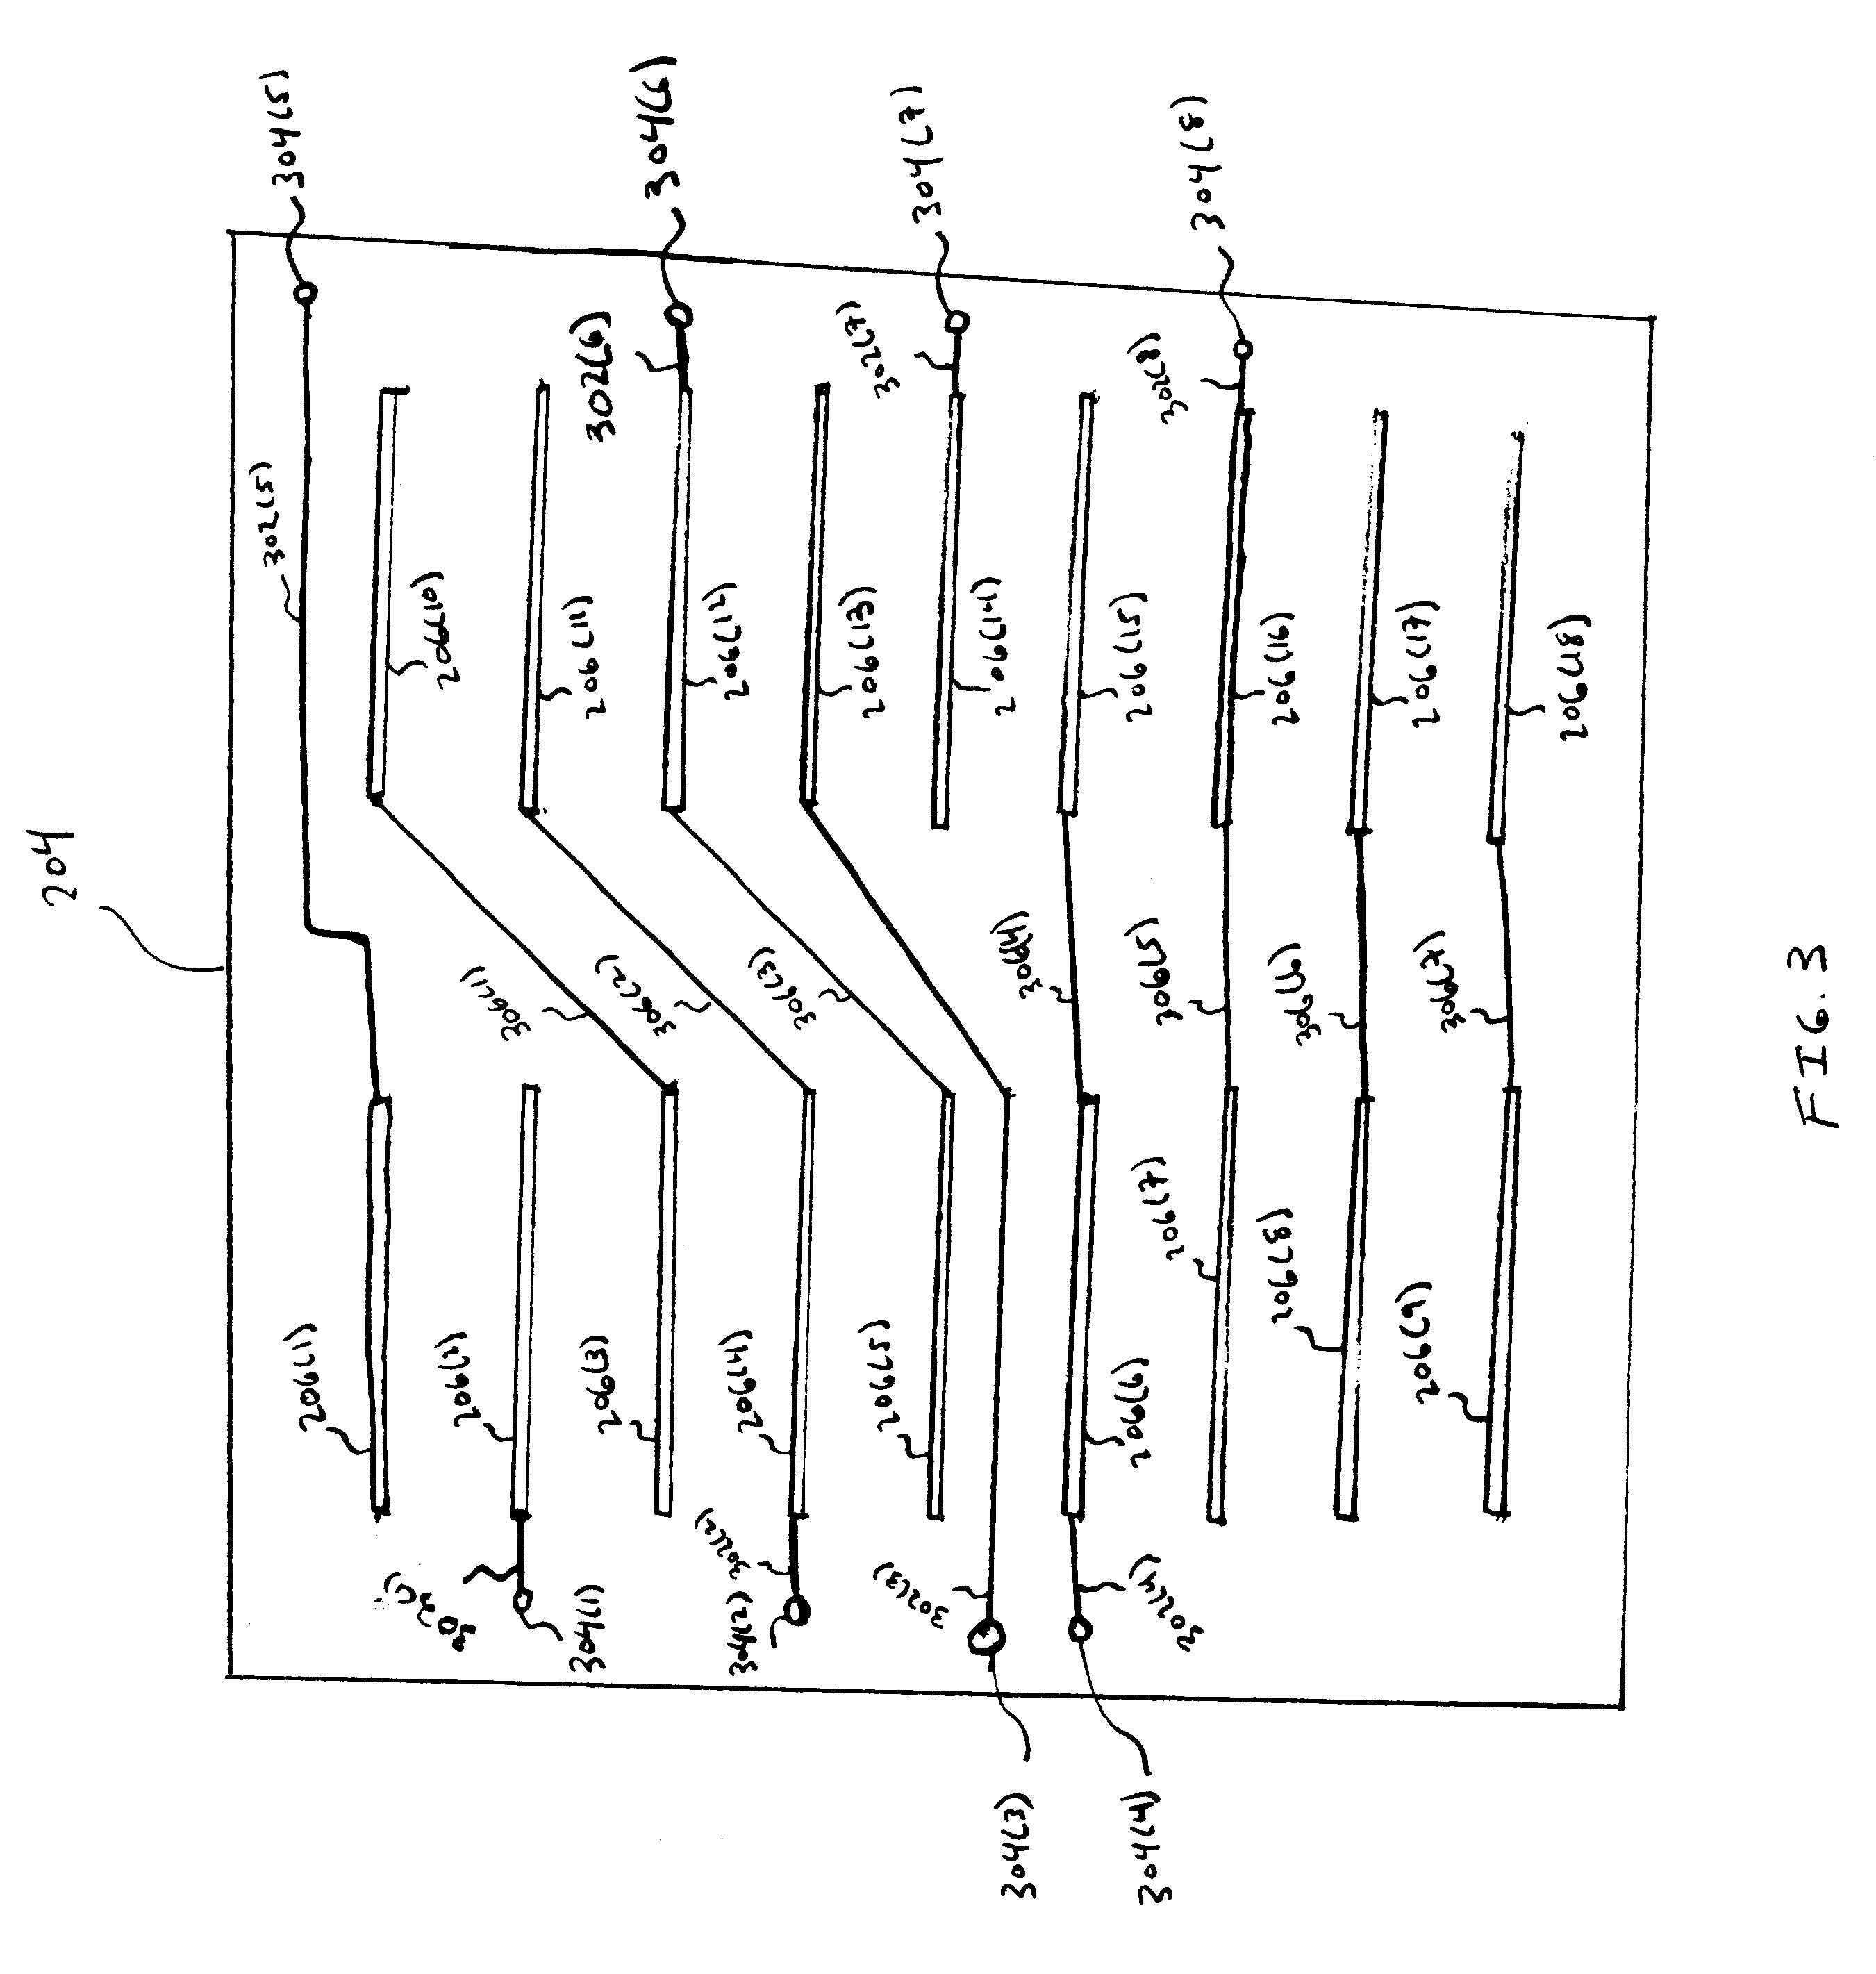 patente us6664881